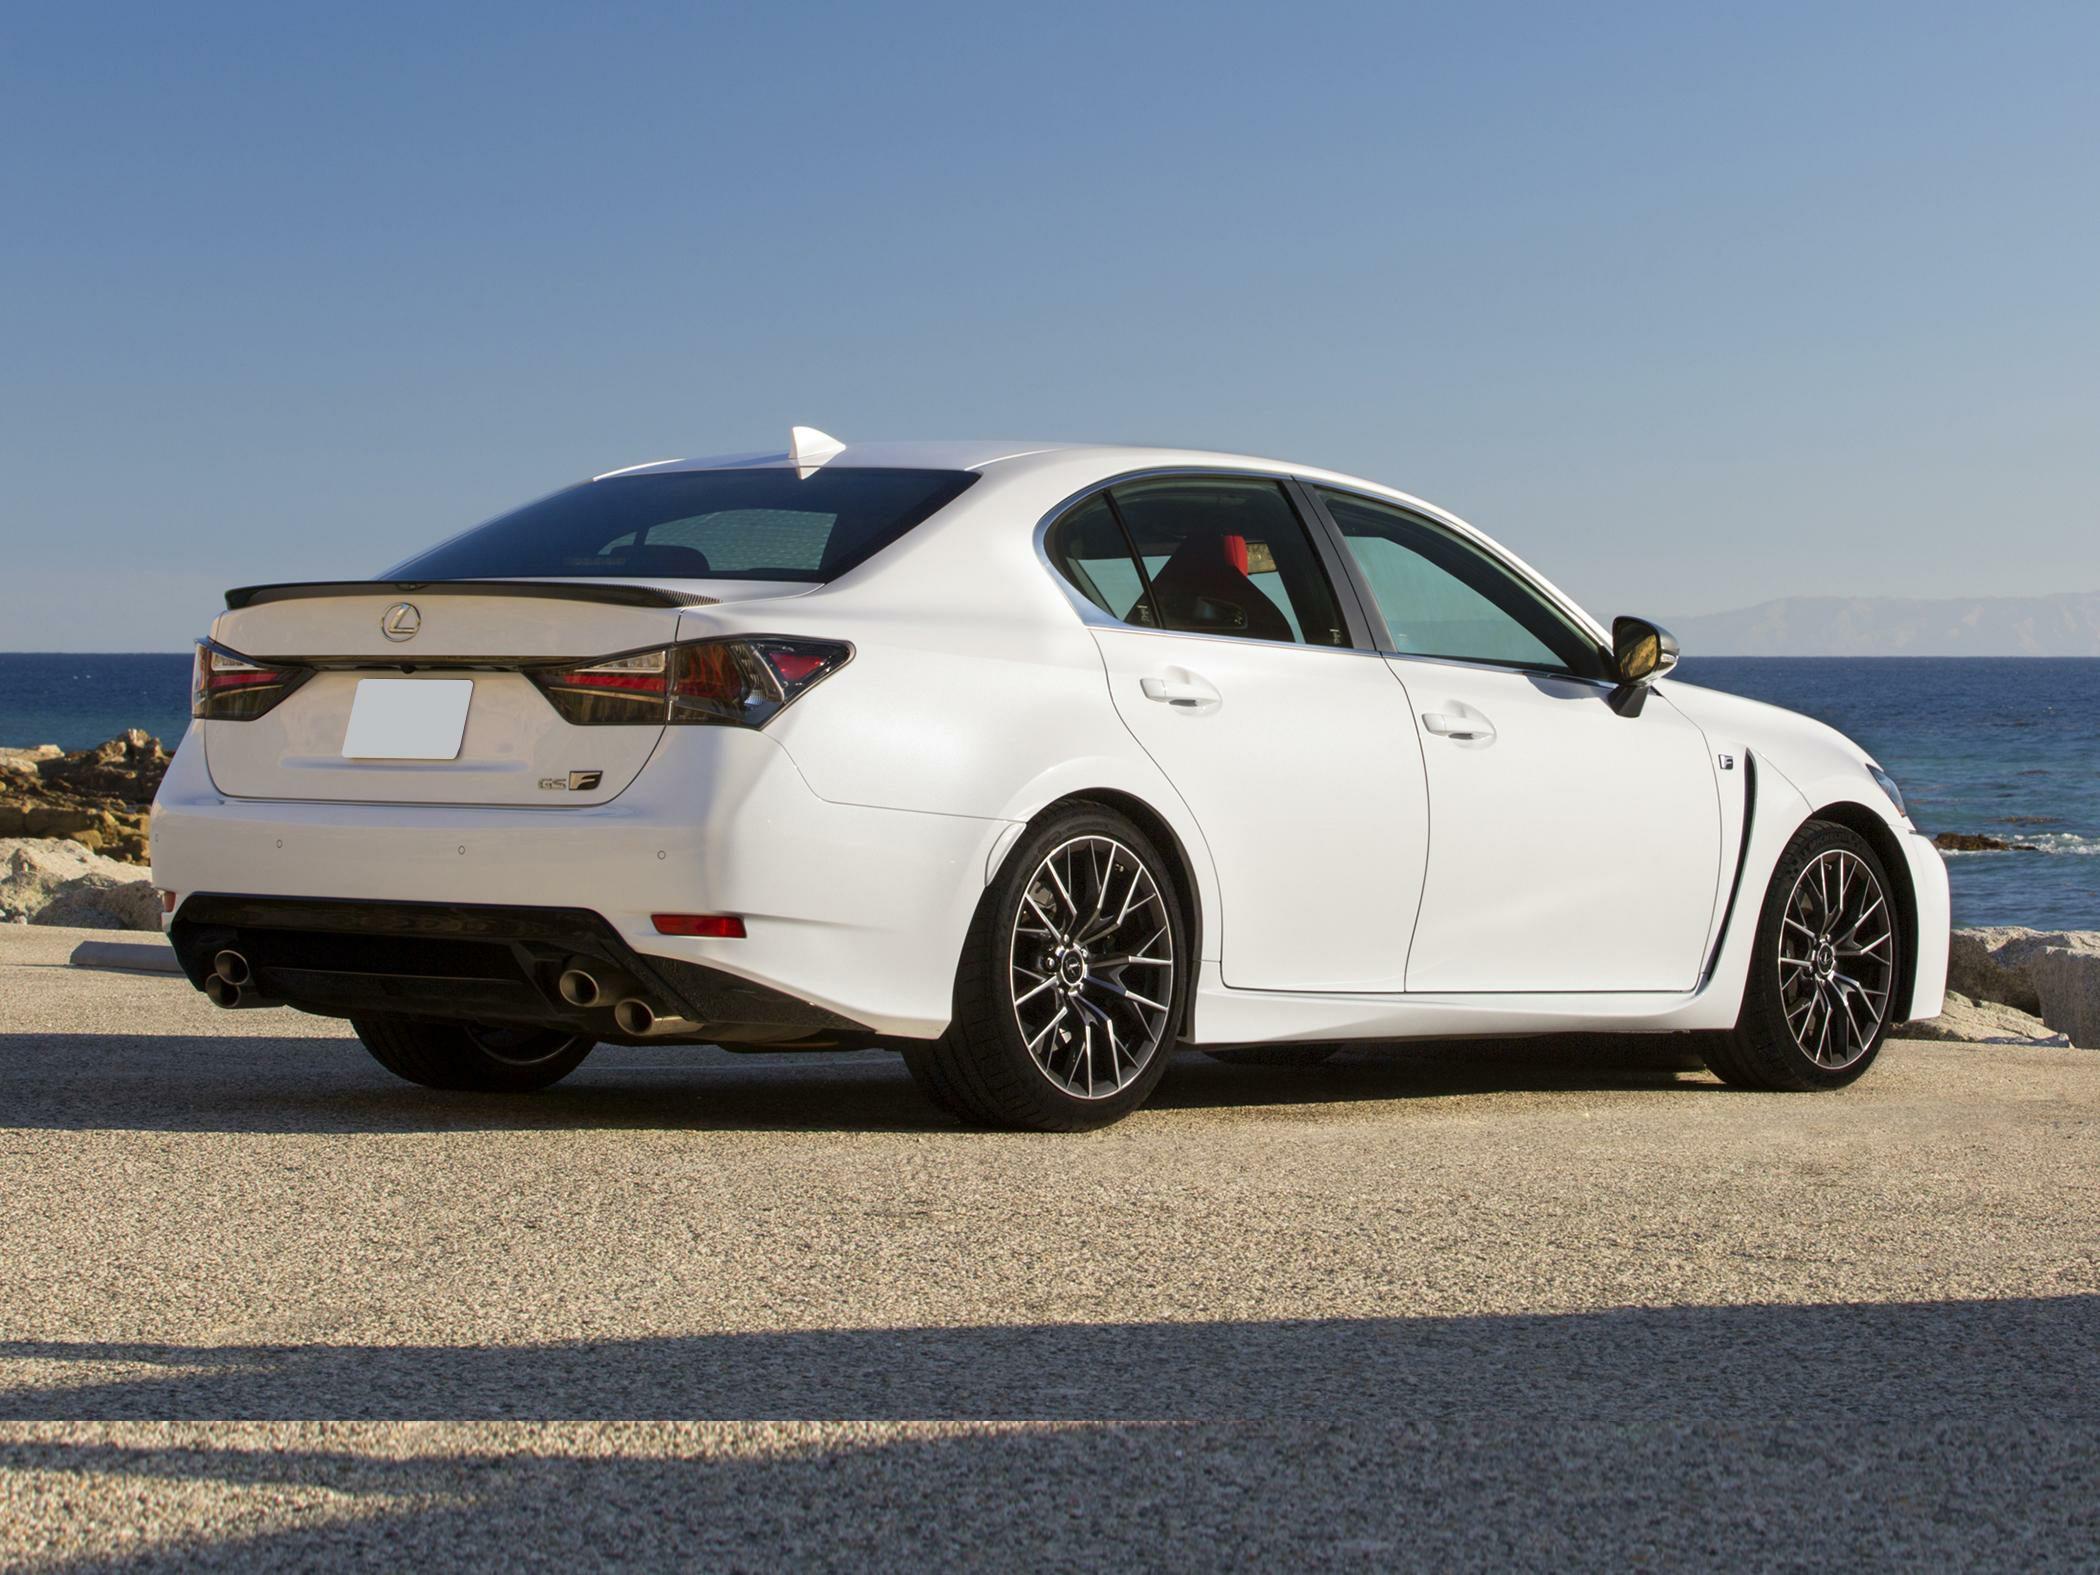 2018 Lexus Gs 350 Deals Prices Incentives Leases Overview